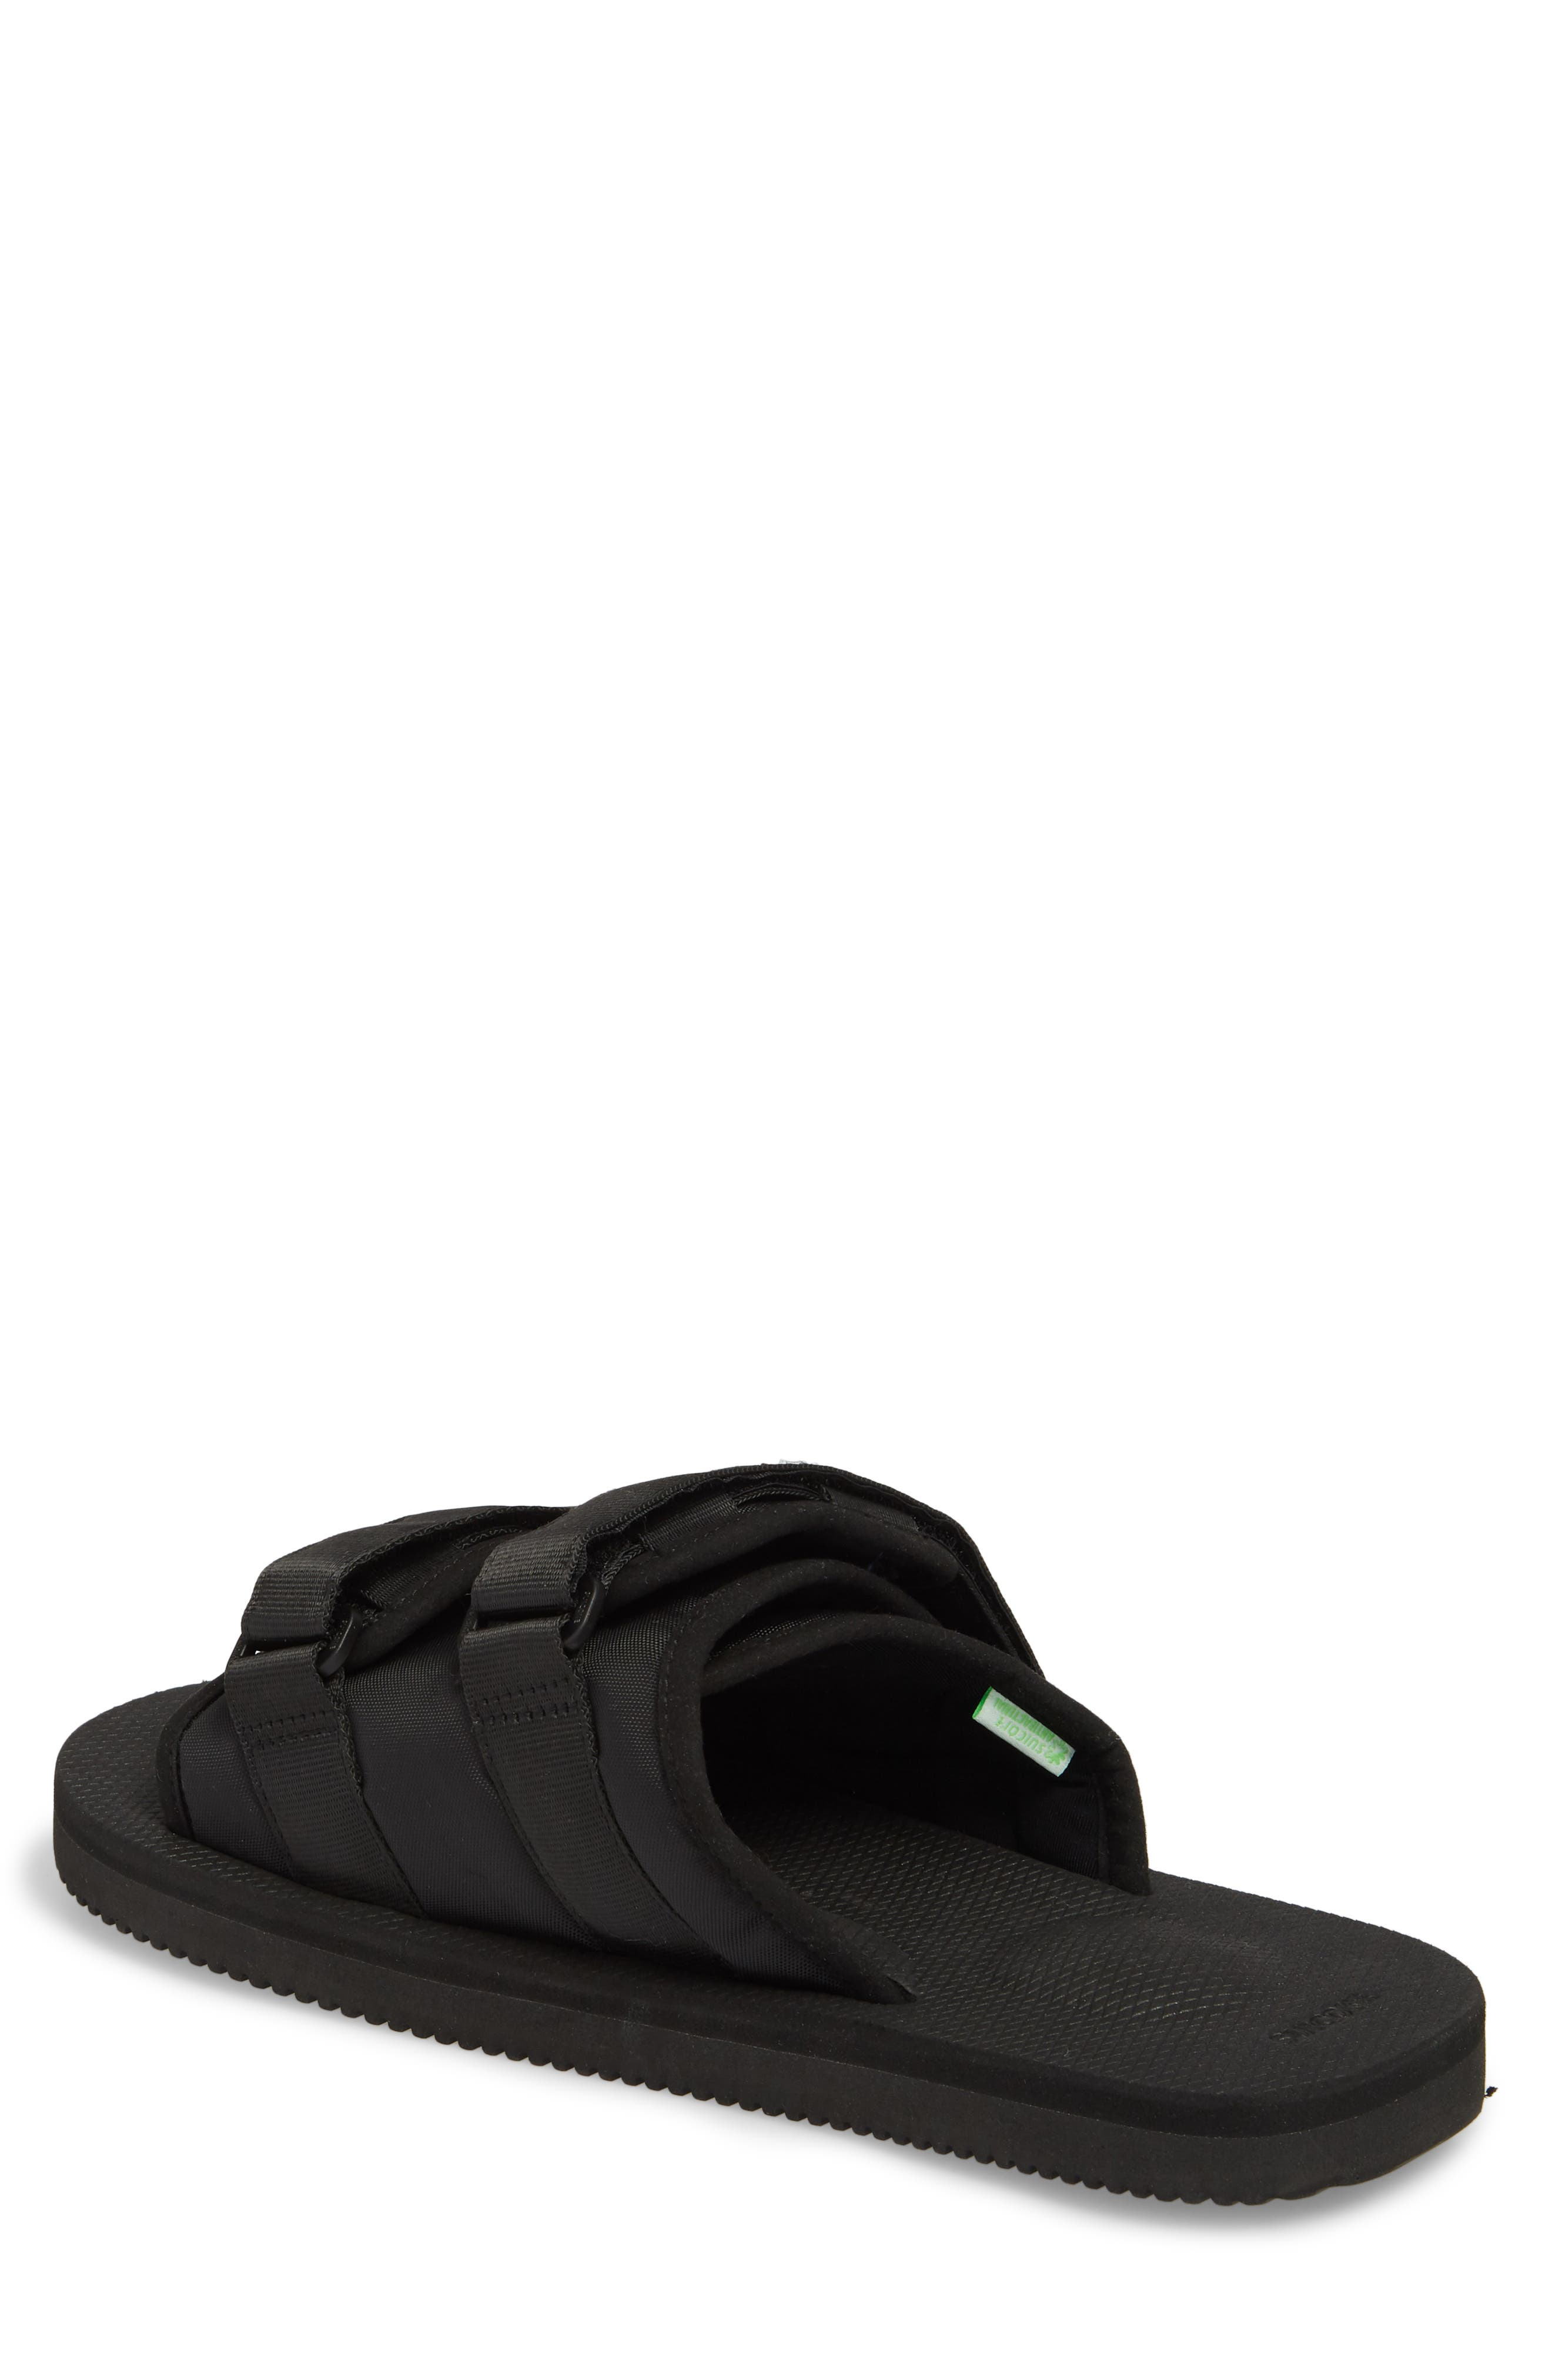 Moto Cab Slide Sandal,                             Alternate thumbnail 2, color,                             Black